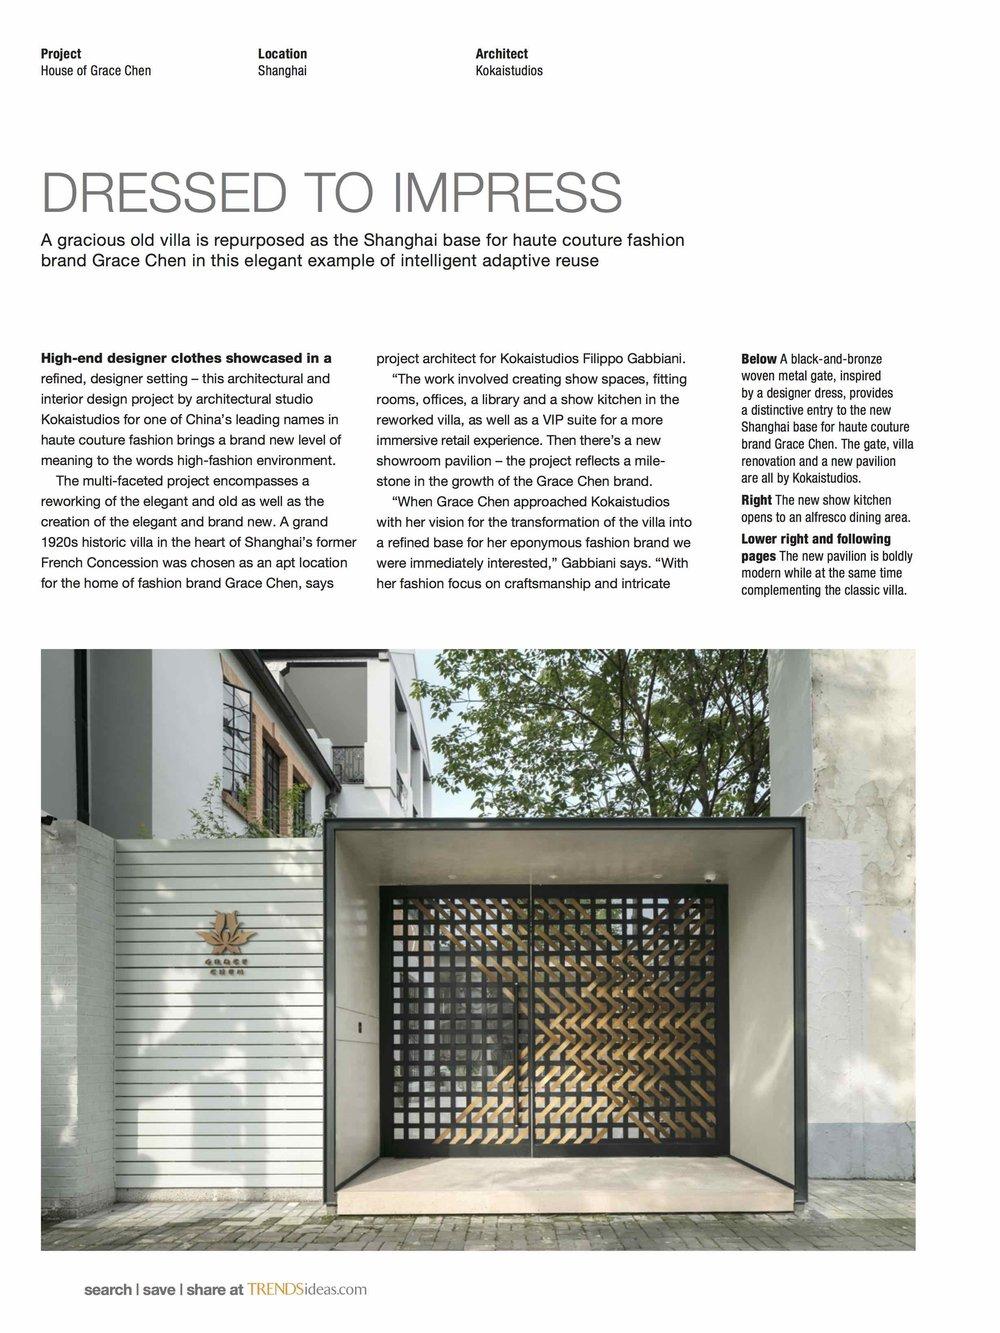 Trends Commercial Design | October 2017 - House of Grace Chen |Kokaistudios